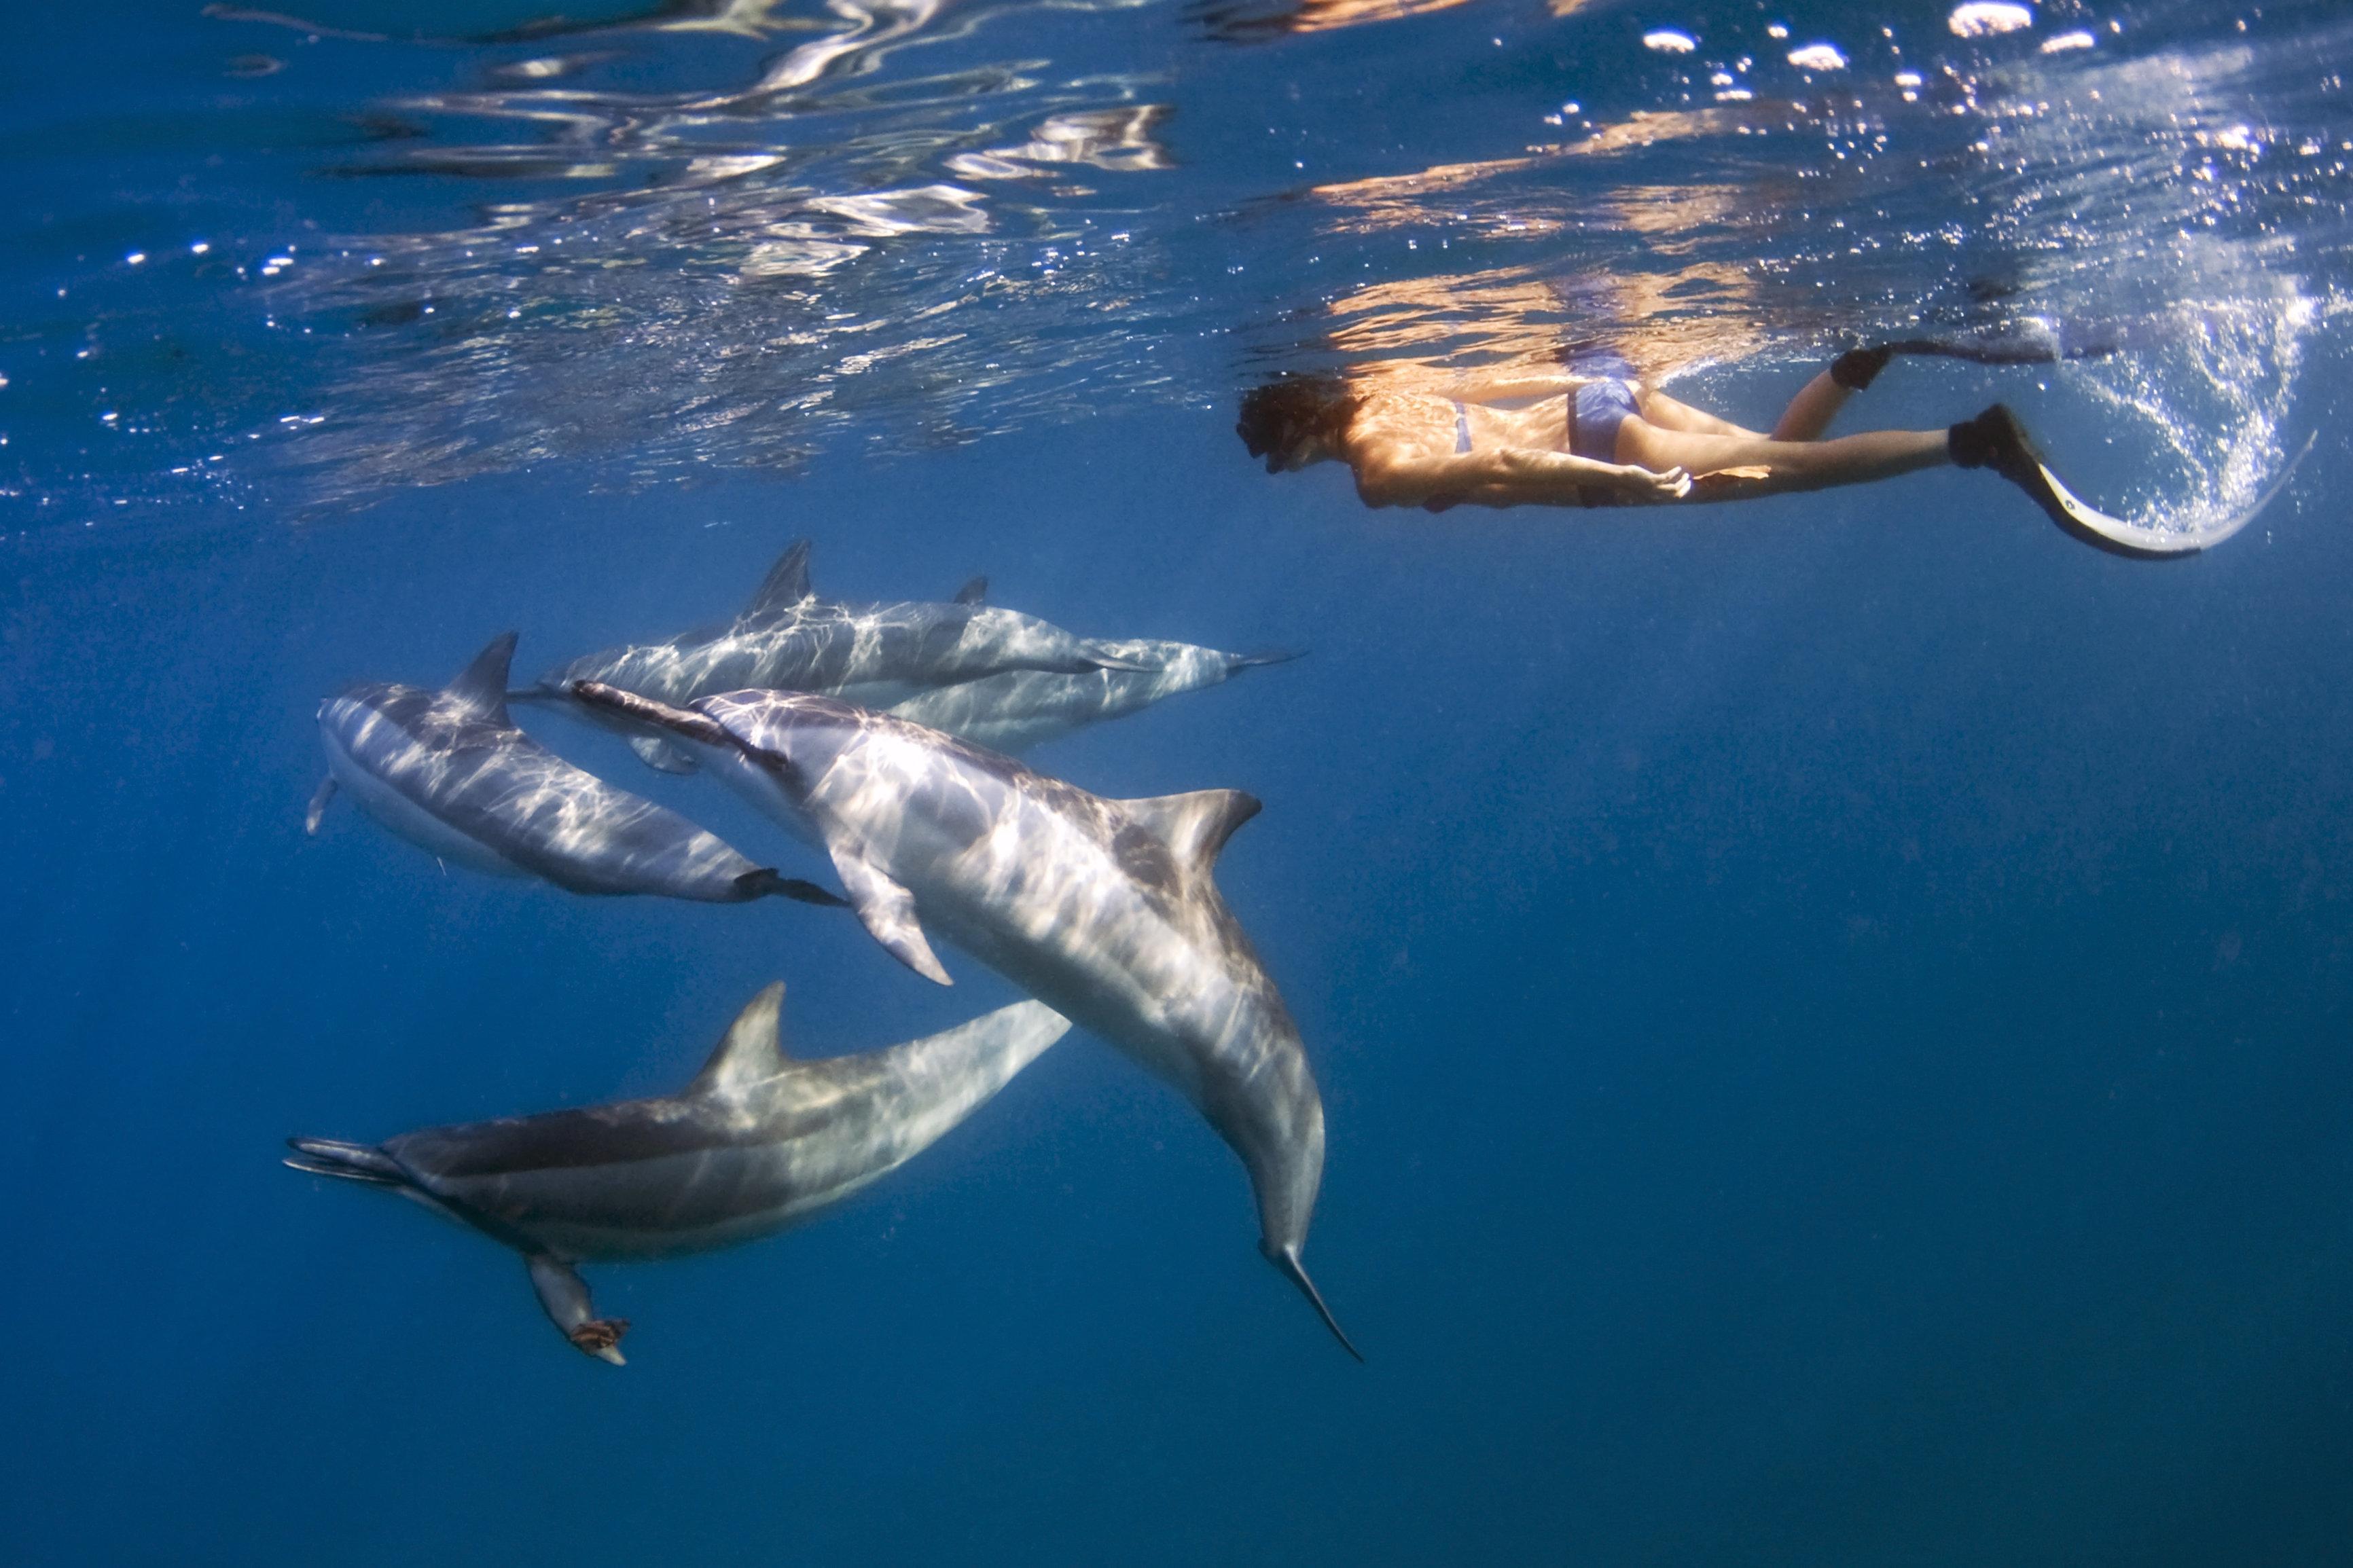 Hawaii, Big Island, Kona Coast, Hawaiian Spinner Dolphins (Stenella longirostris) swimming with free diver